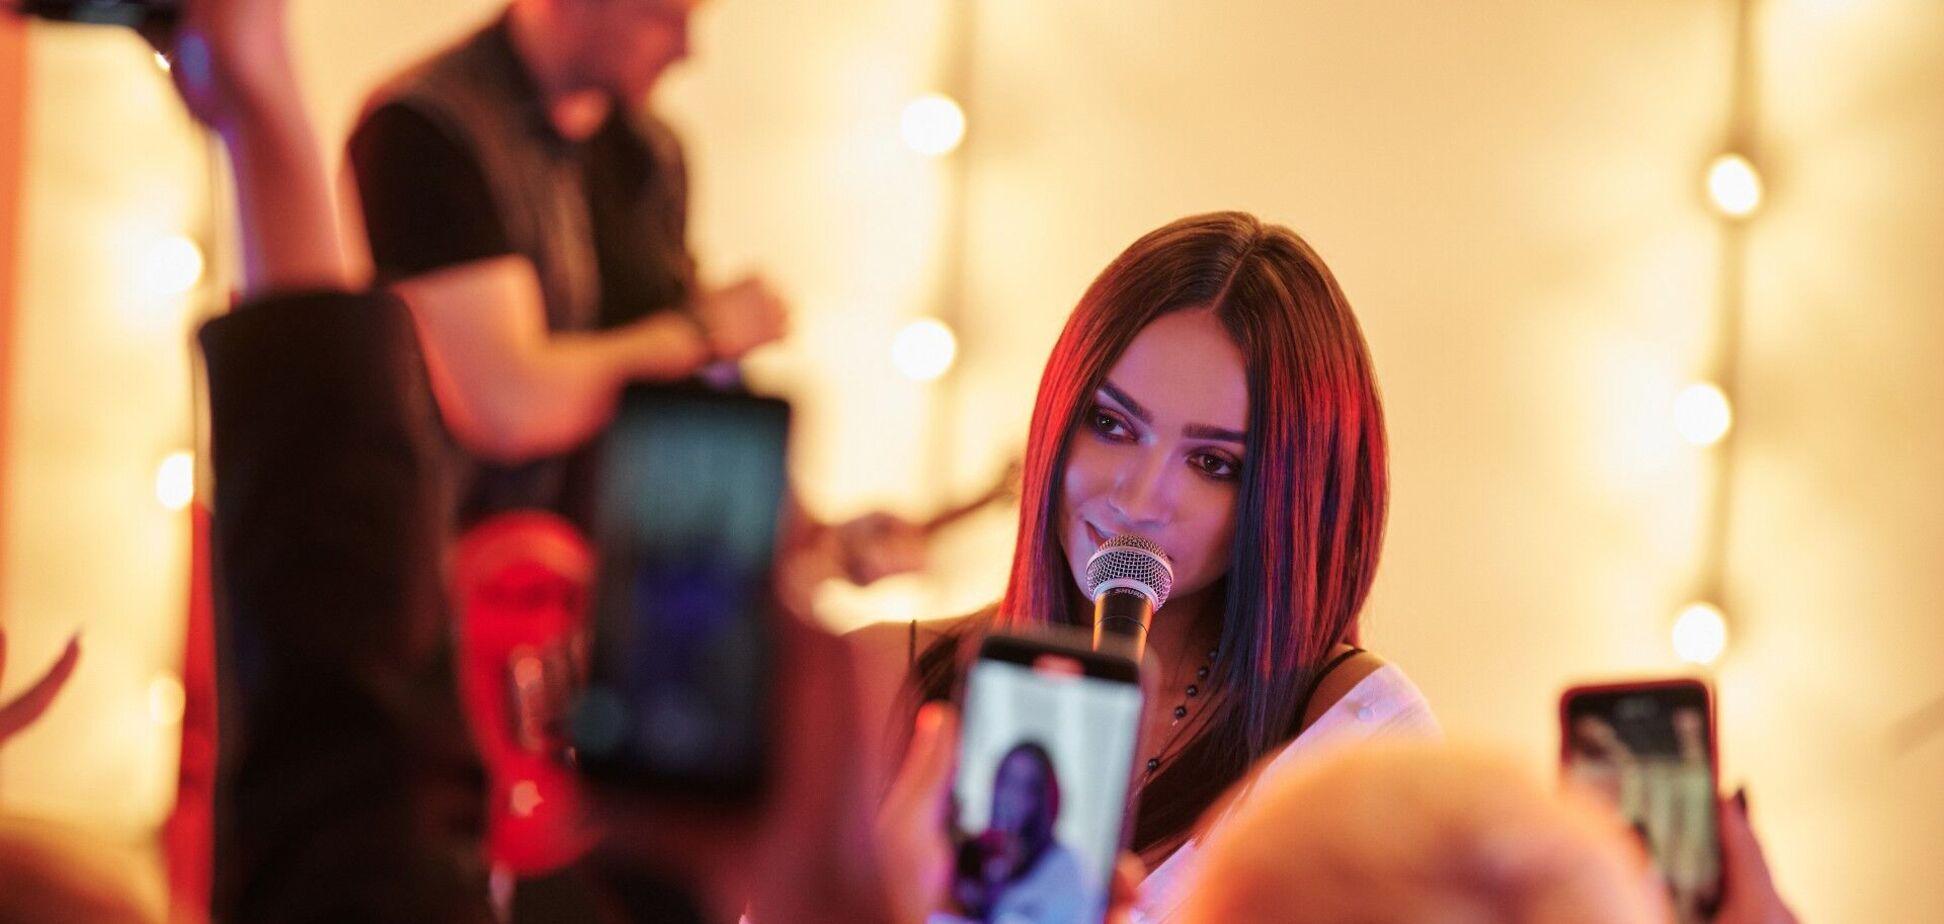 Катя Вандина  презентовала видео на песню 'Мама говорила'